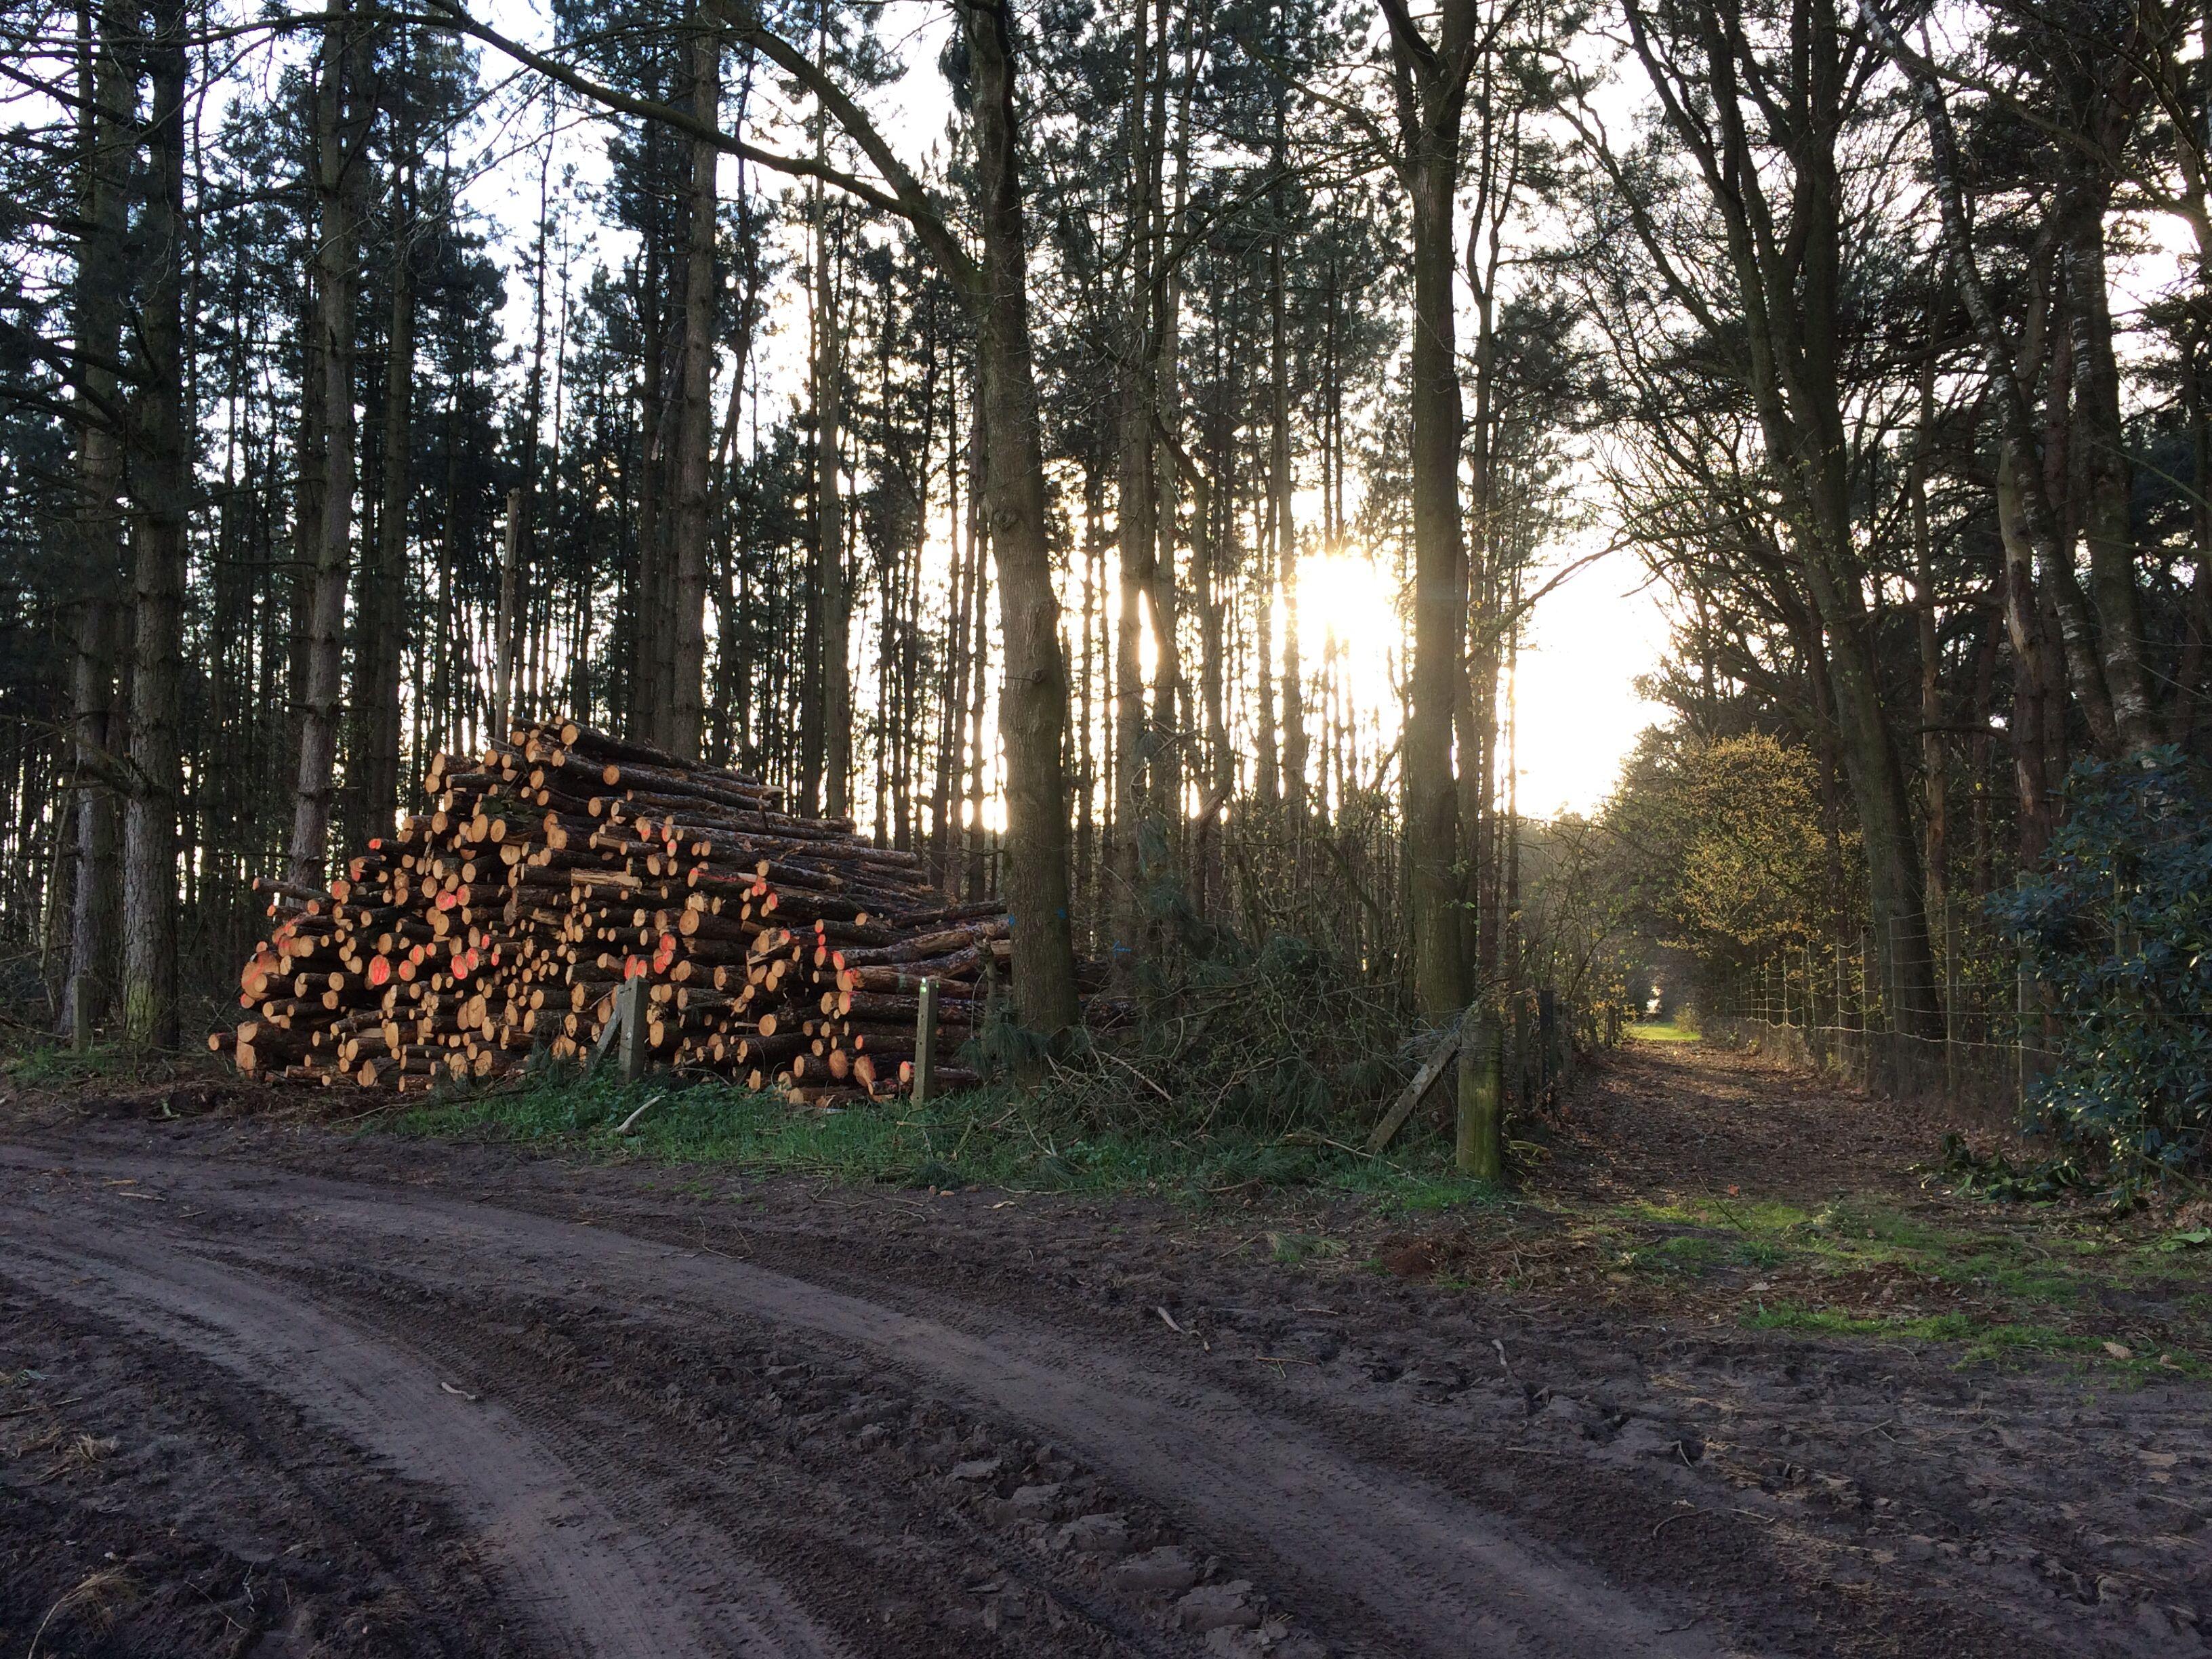 Wandeling - bomen - werk